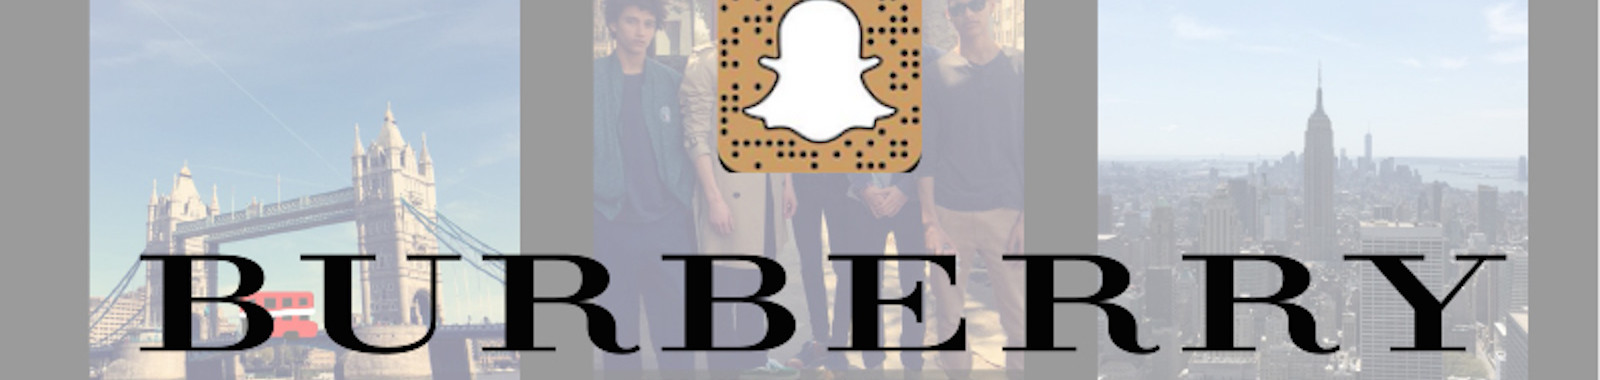 BurberrySnapchatBanner